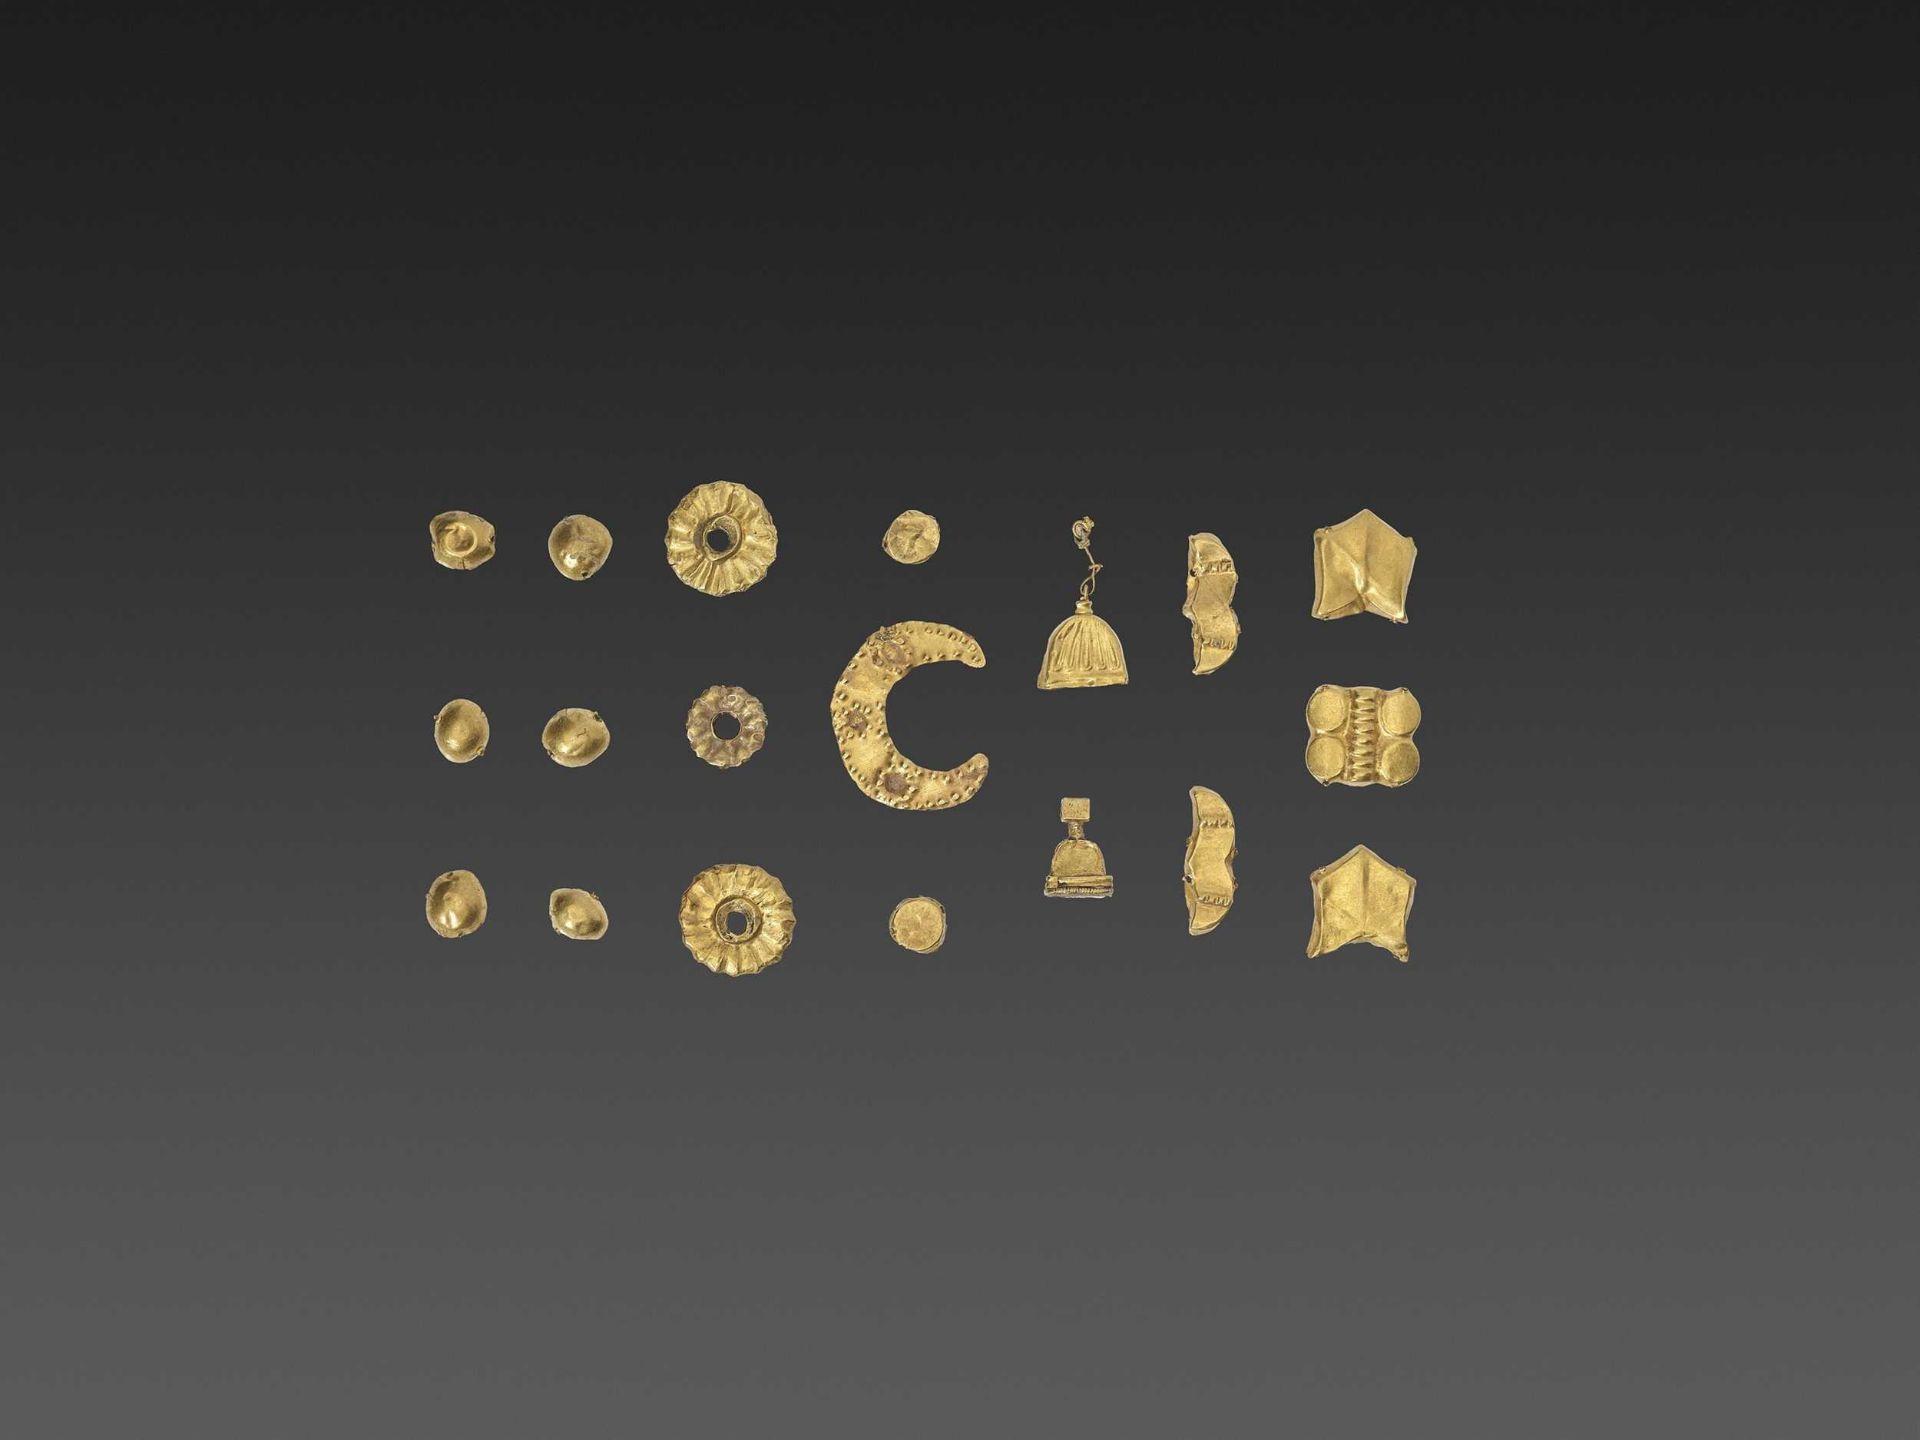 19 BACTRIAN GOLD GARMENT ORNAMENTS